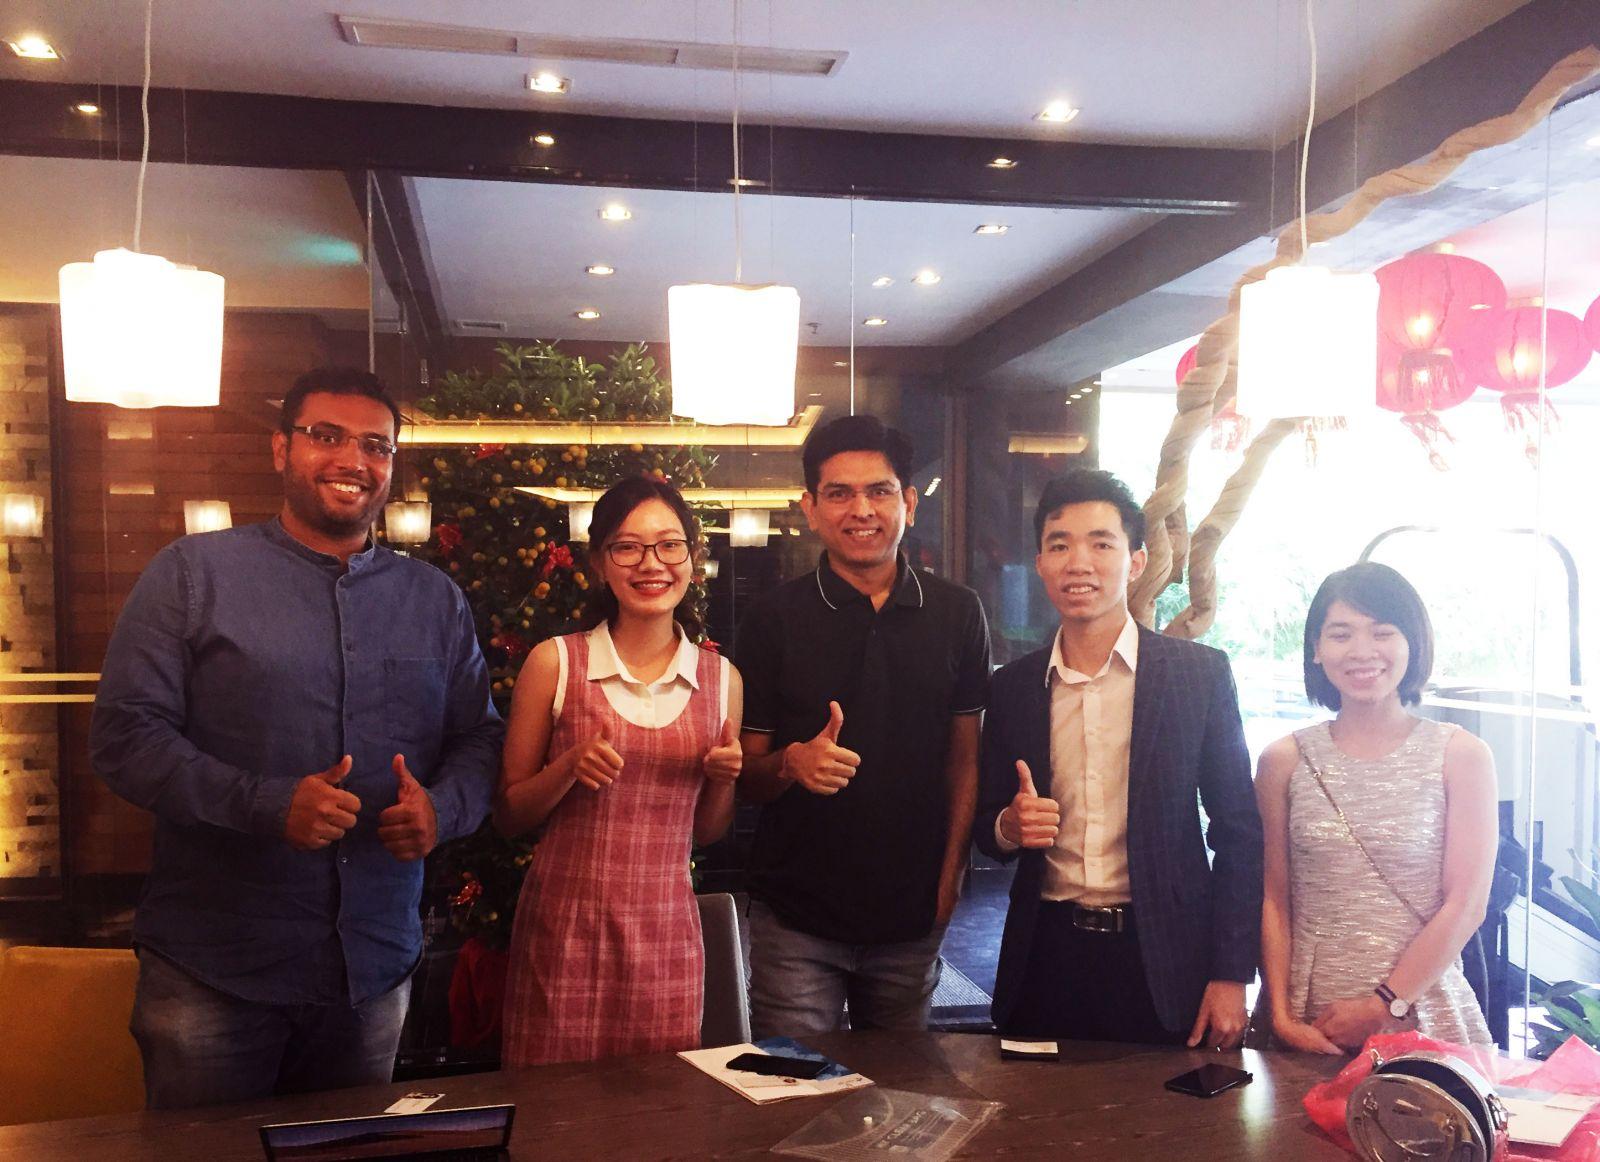 XinFin Public Network partnership